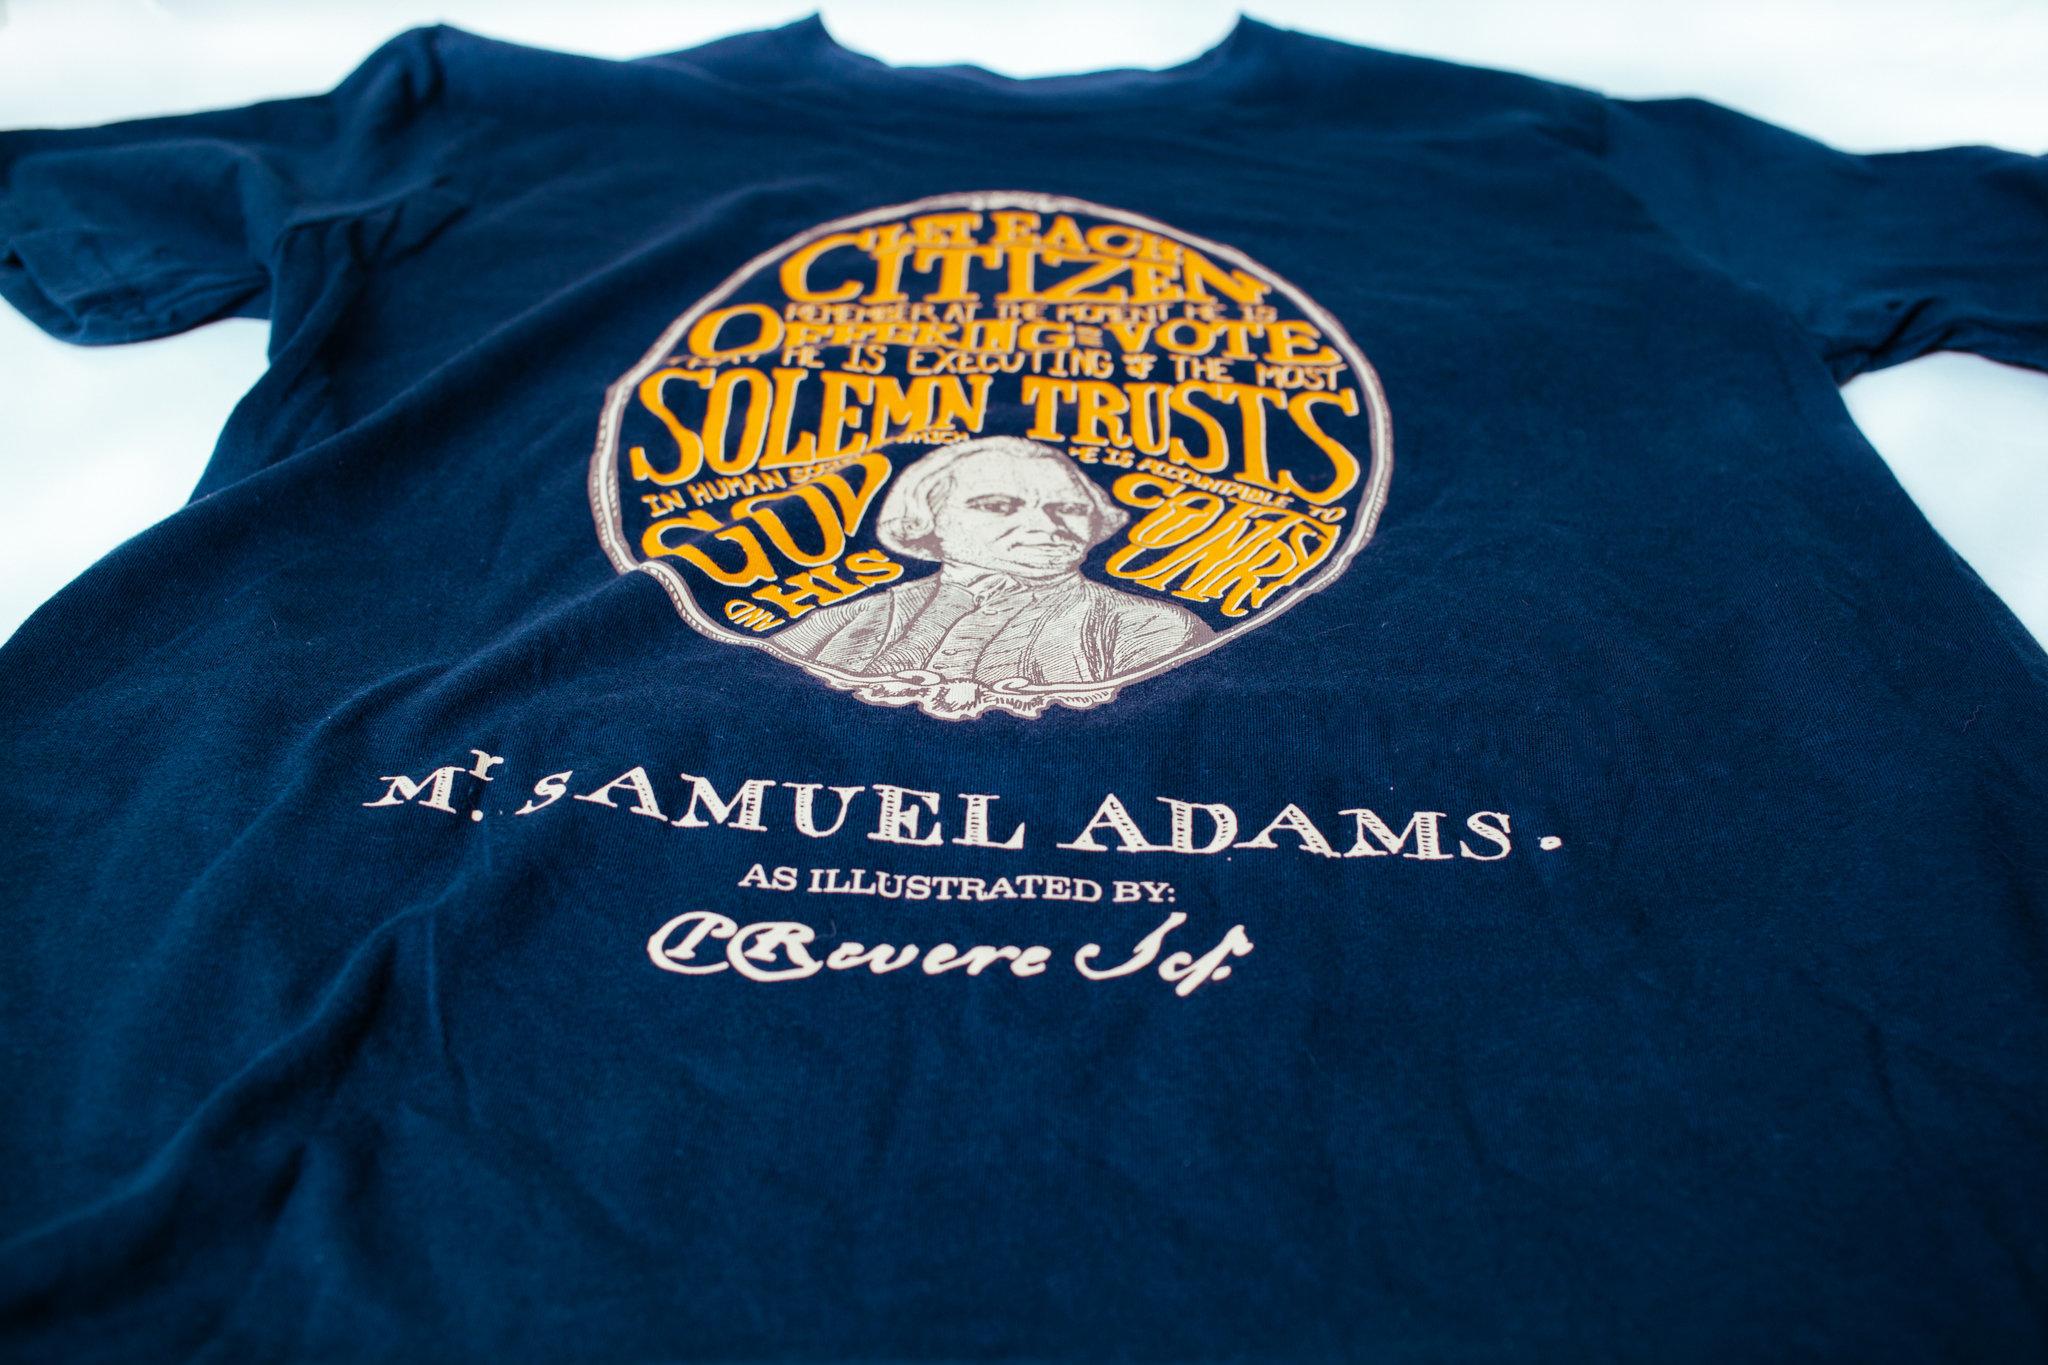 Samuel Adams on voting